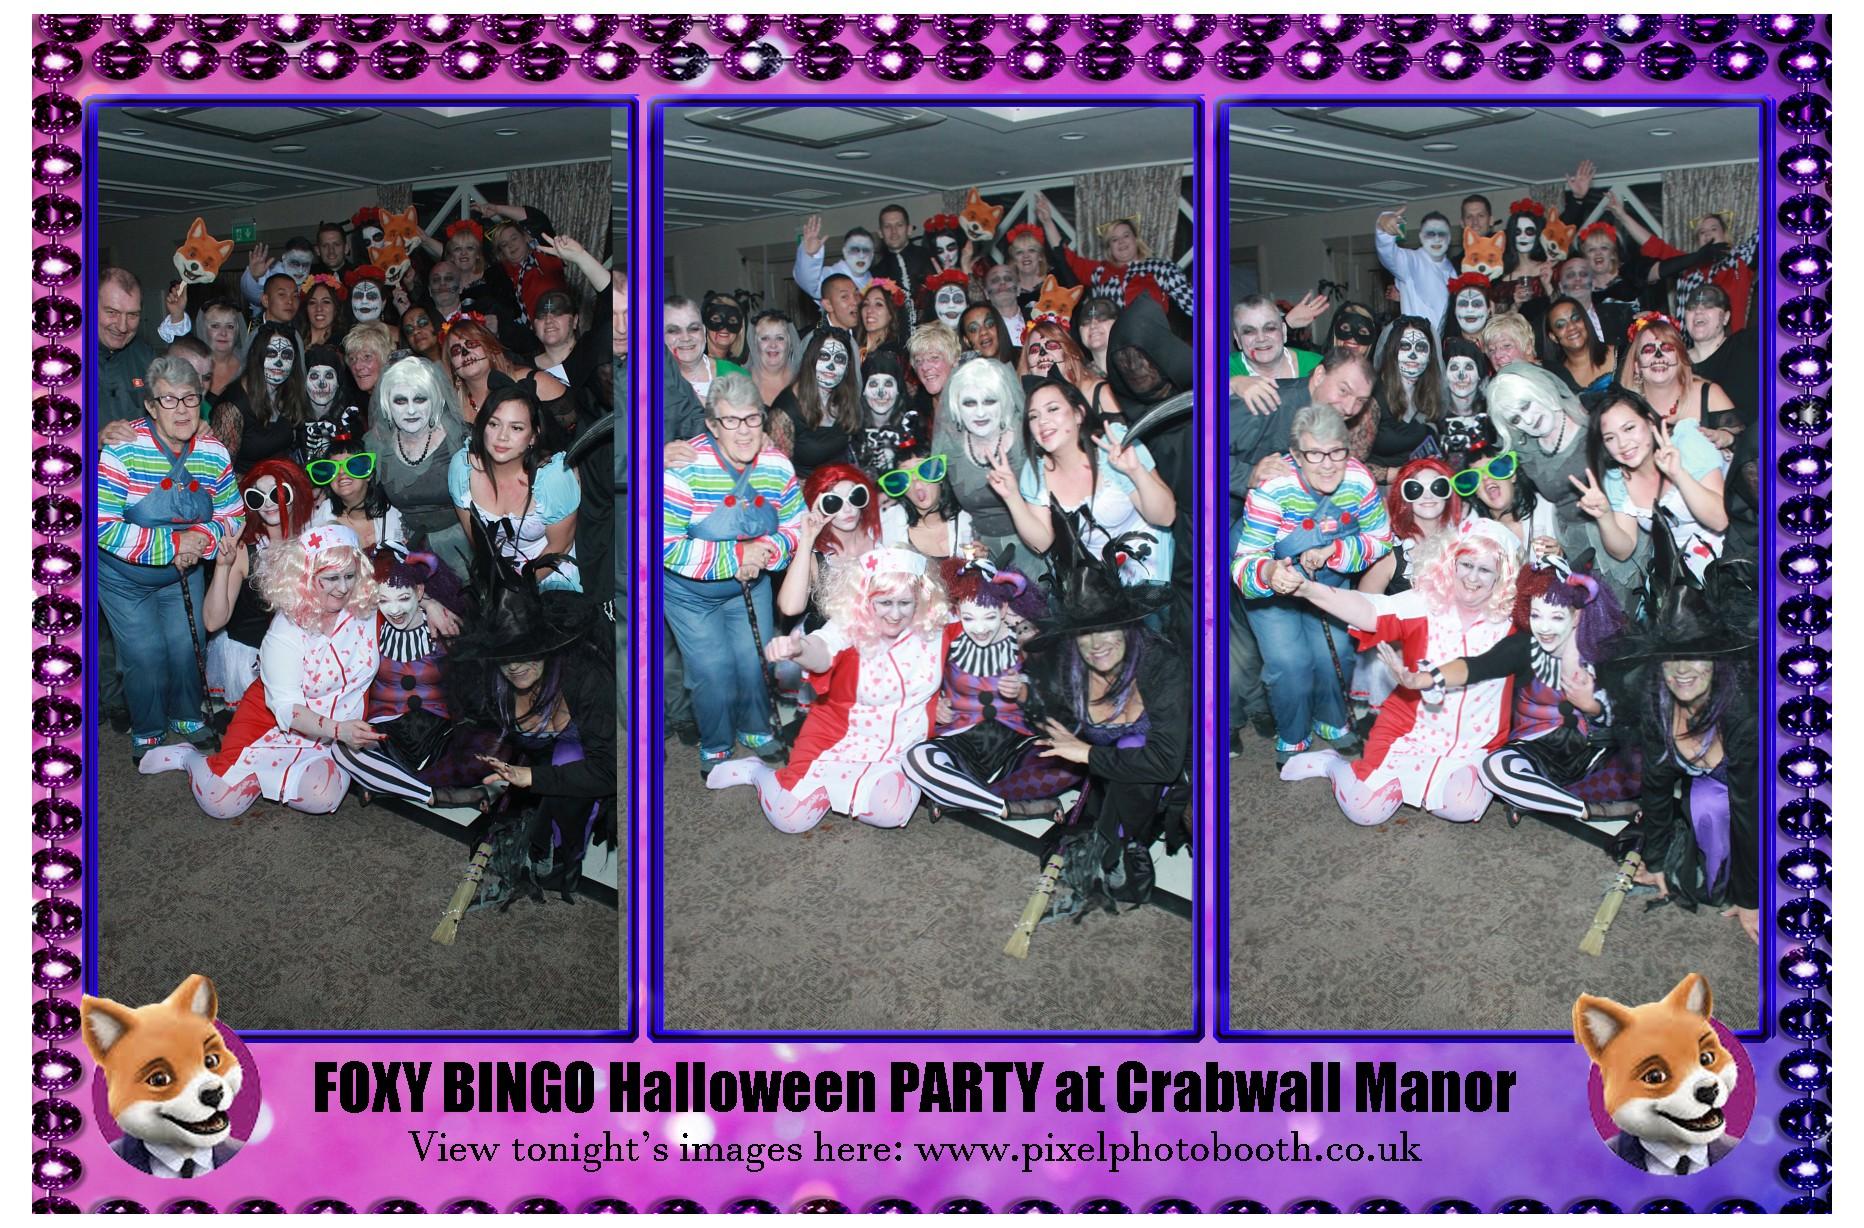 27th Oct 2018: FOXY BINGO at Crabwall Manor